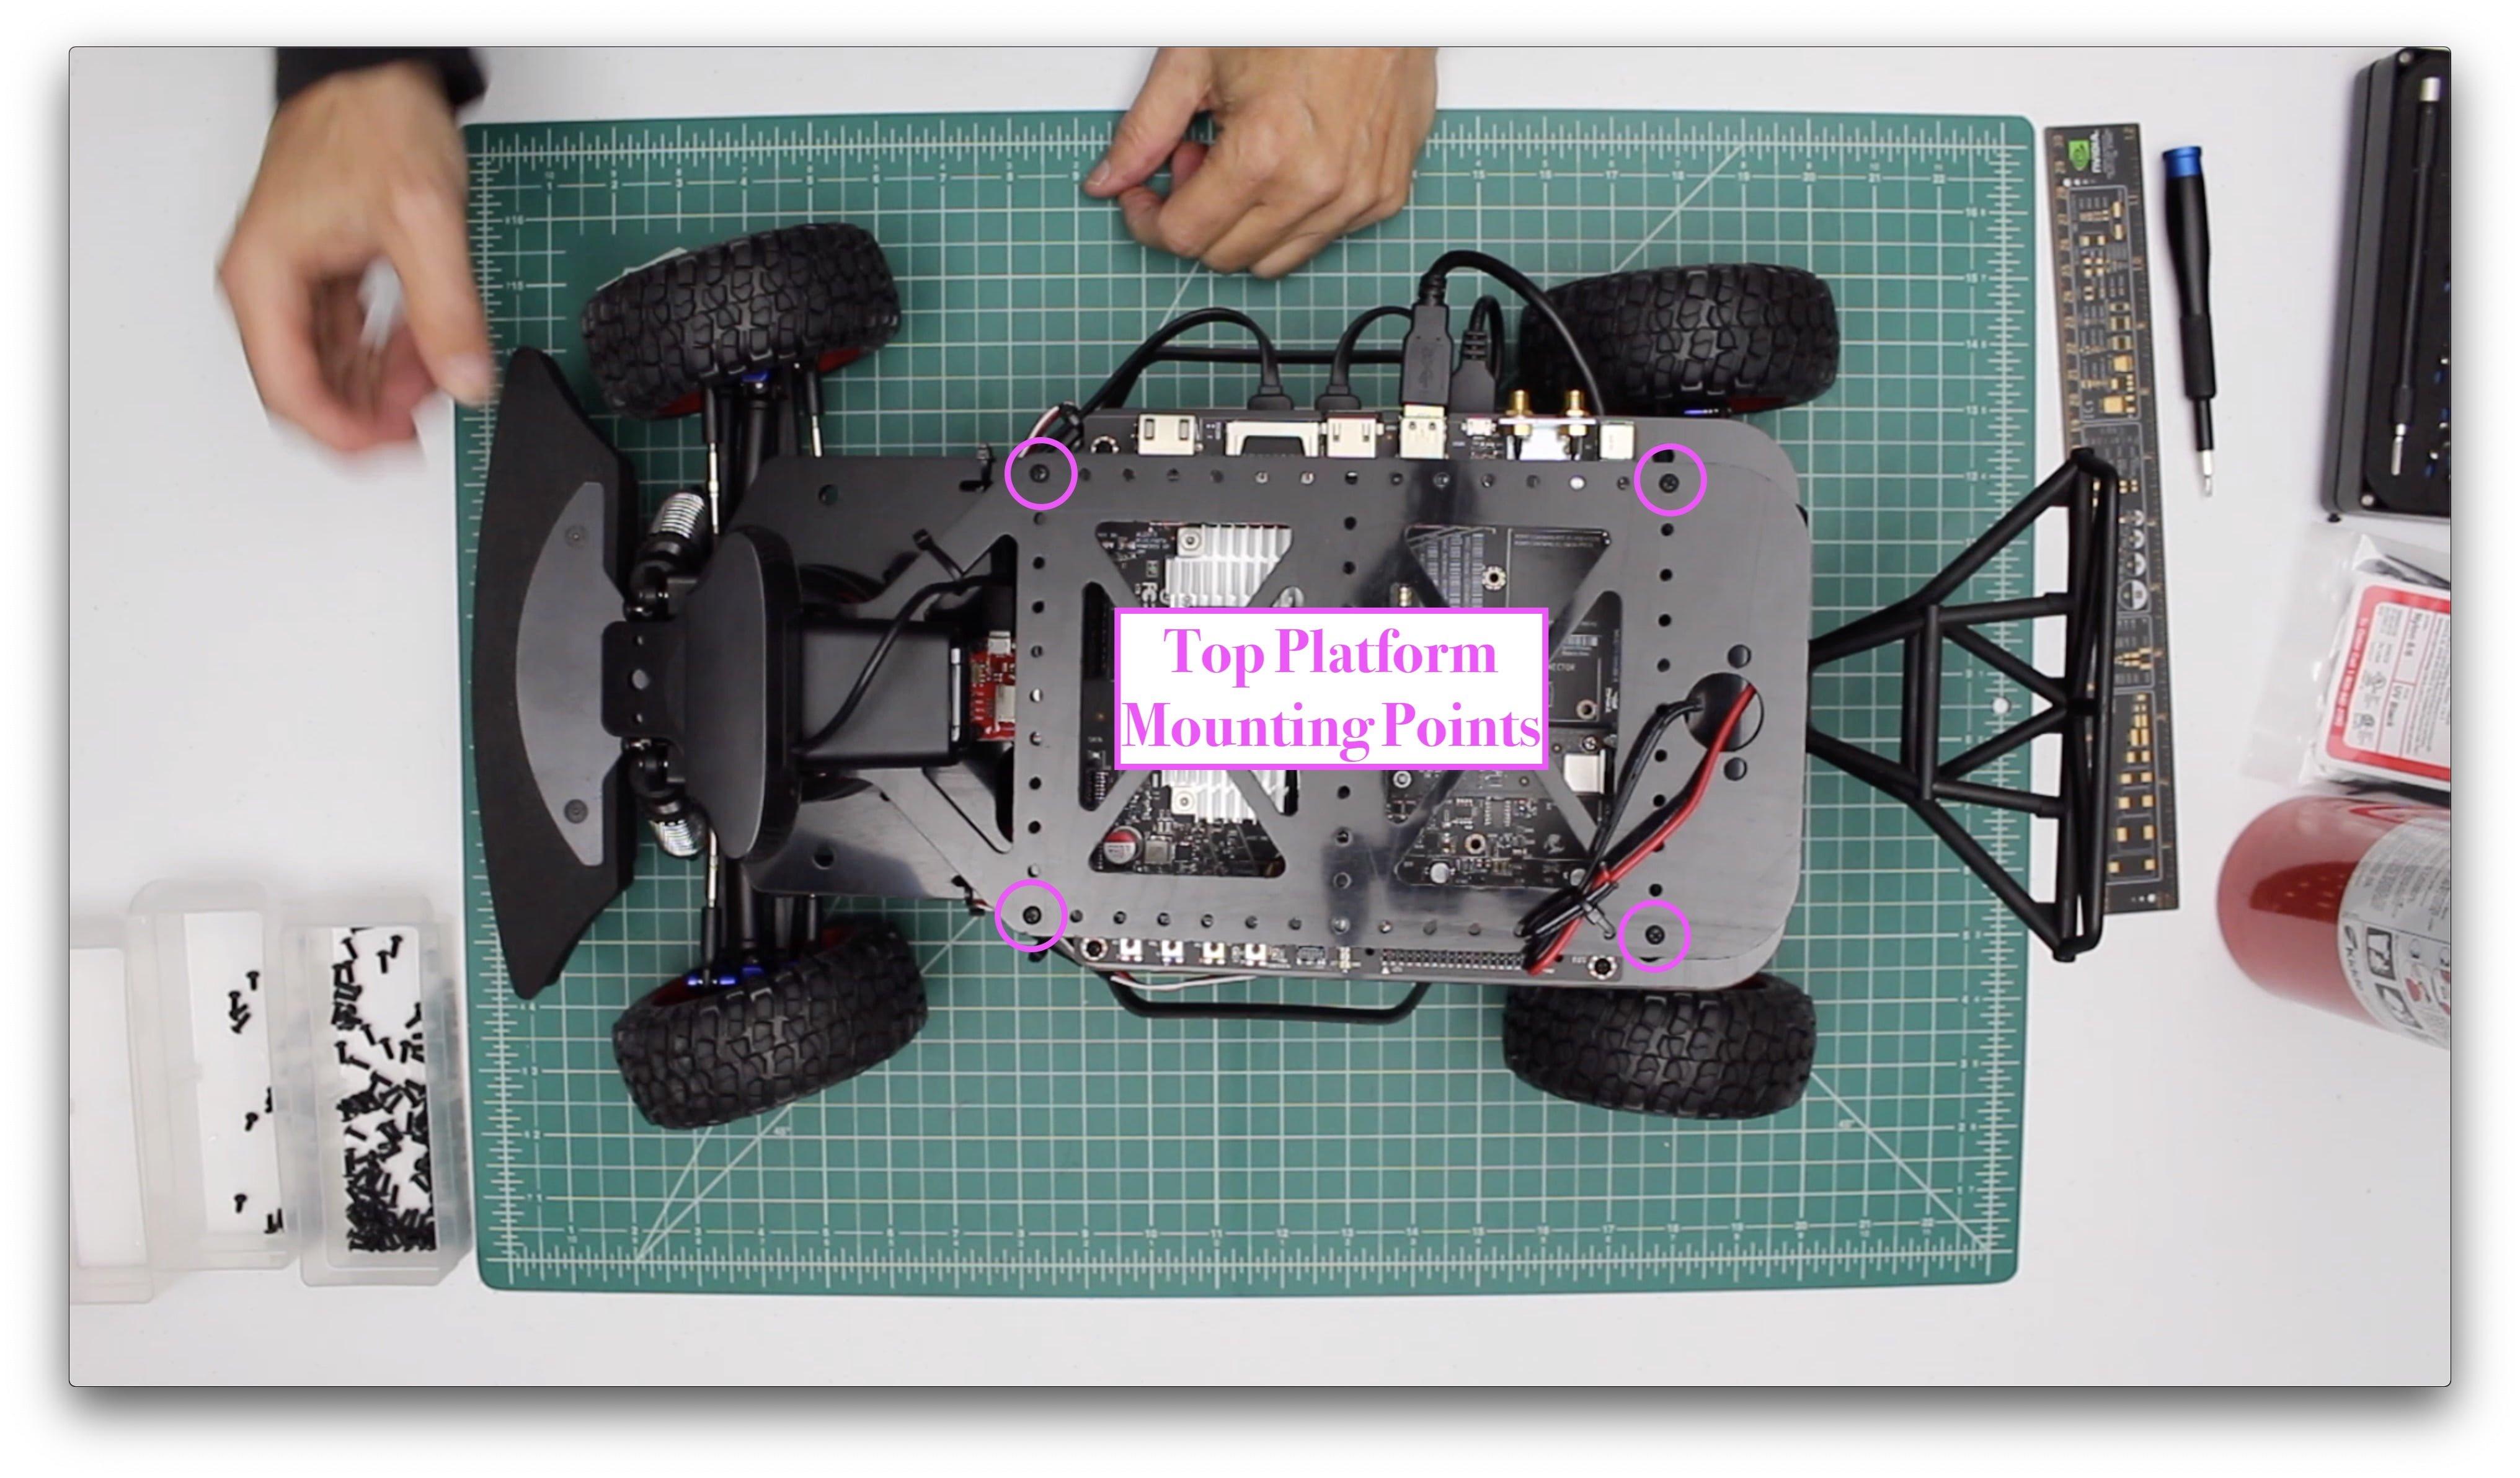 Top Platform Mounting Points